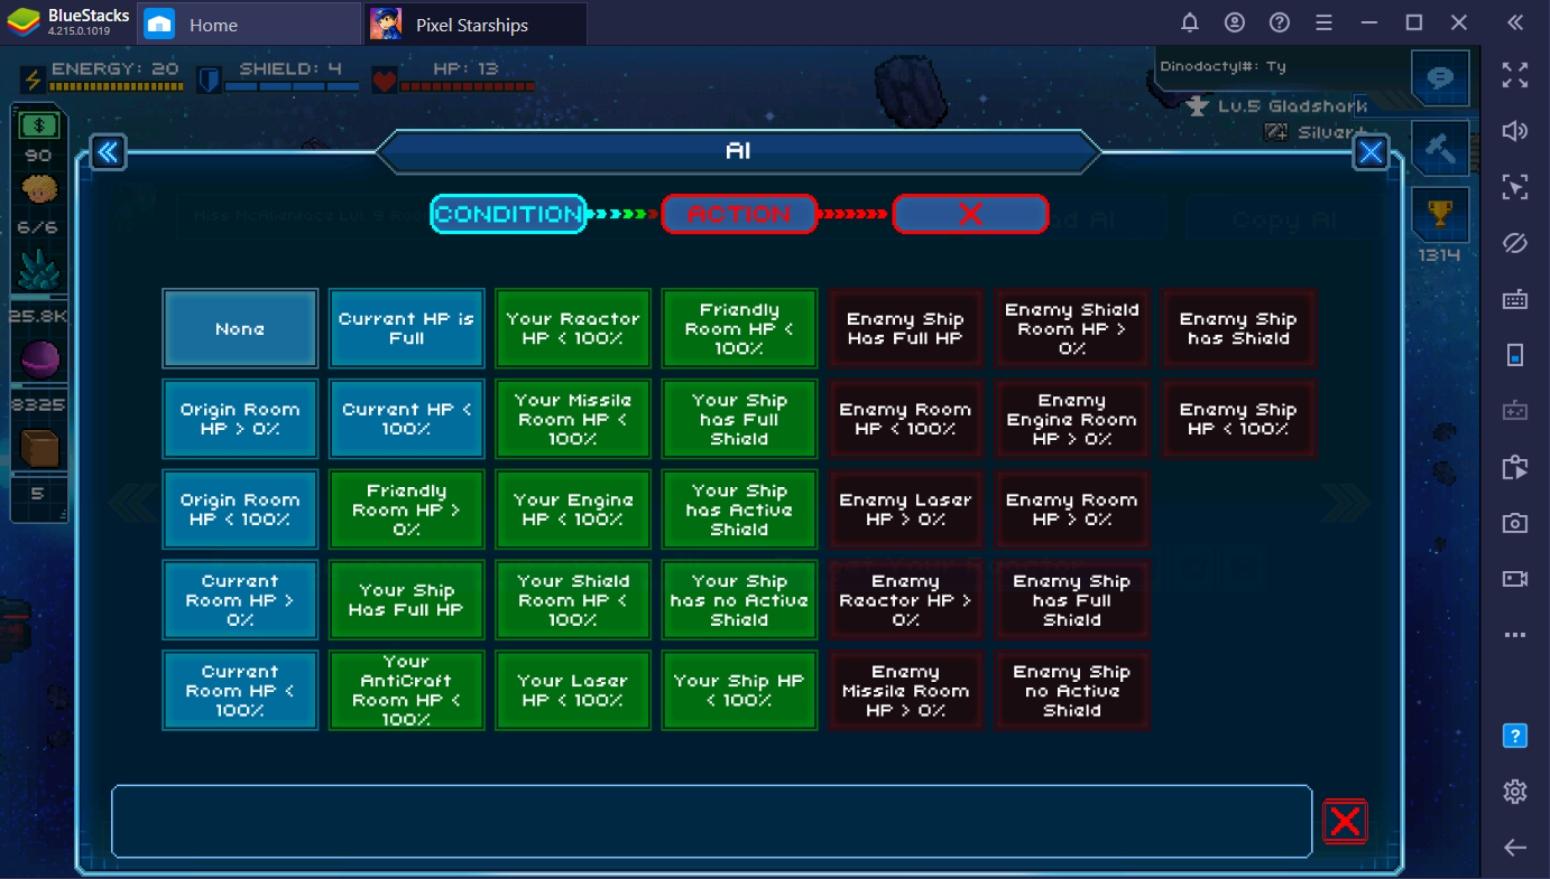 Creating a Battle Ready Vessel in Pixel Starships